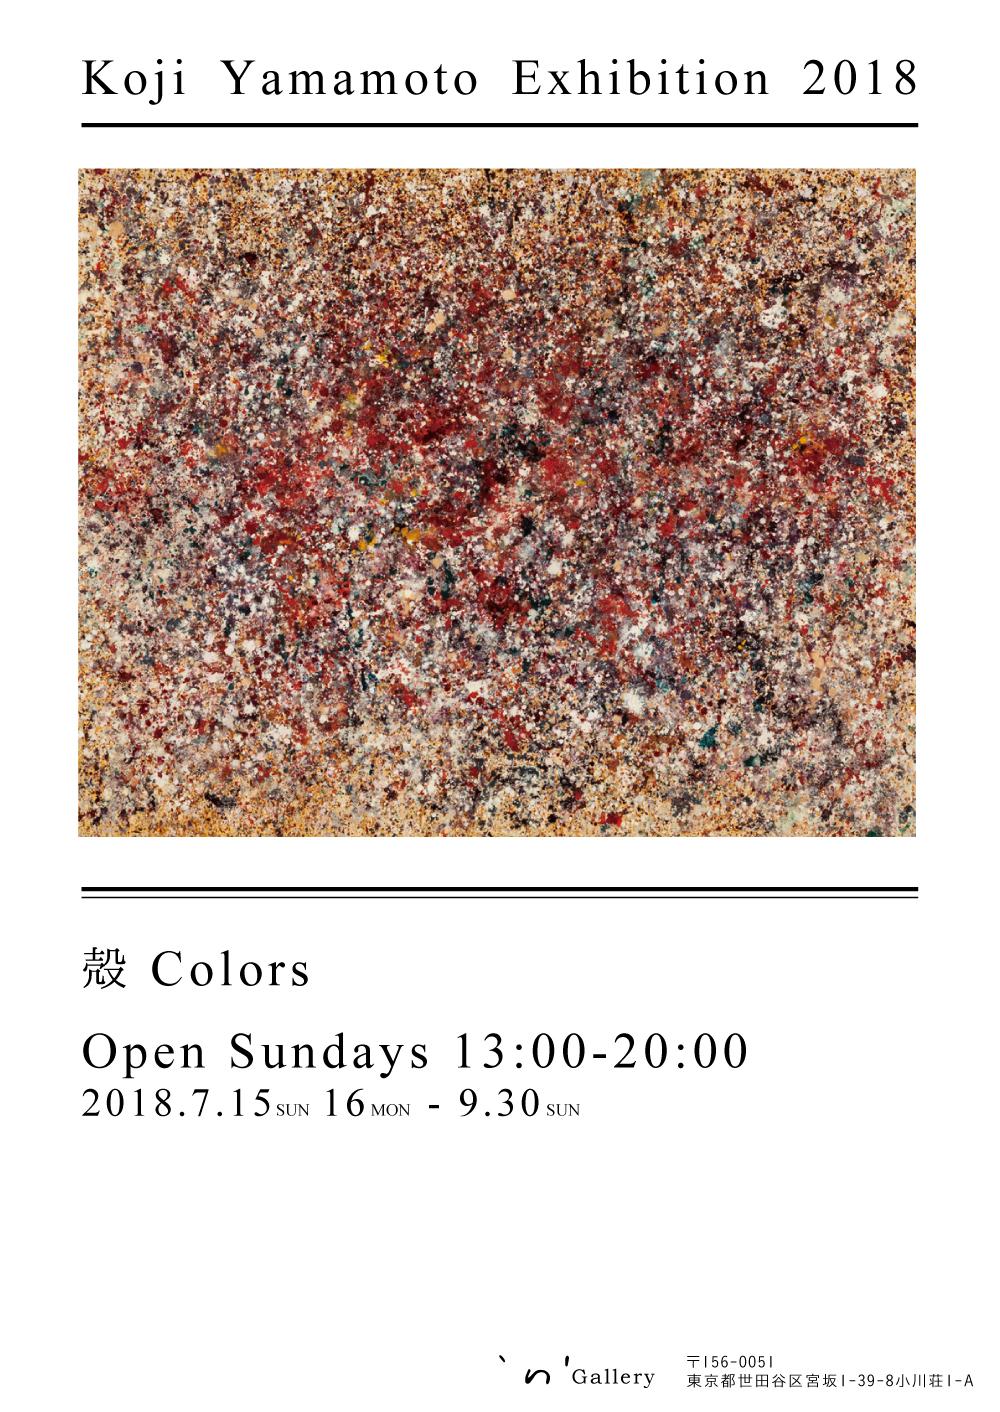 Koji Yamamoto Exhibition 2018「殻 Colors」